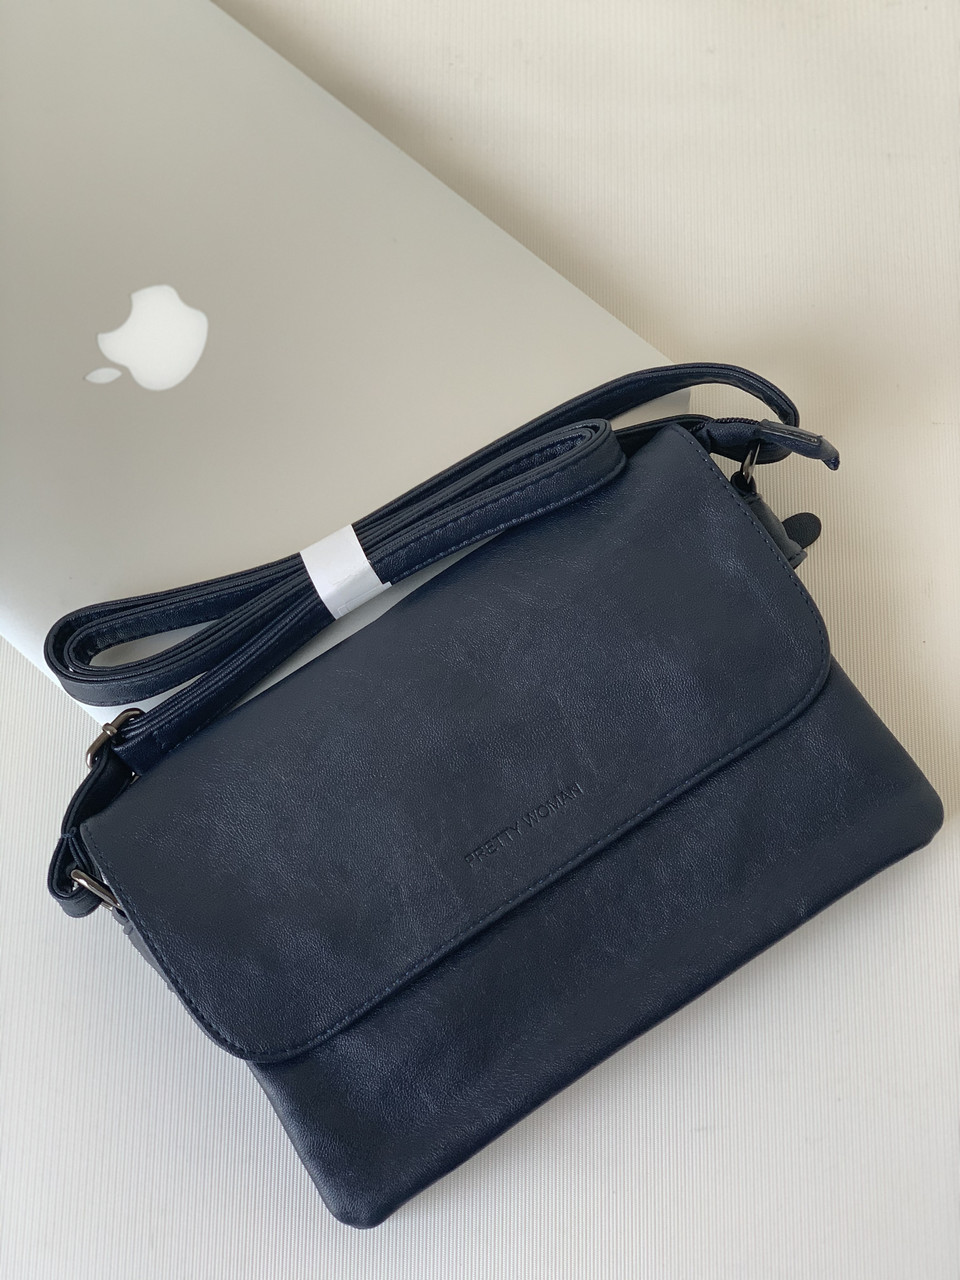 Молодежная мини сумочка клатч кроссбоди повседневный темно-синий через плечо Pretty Woman